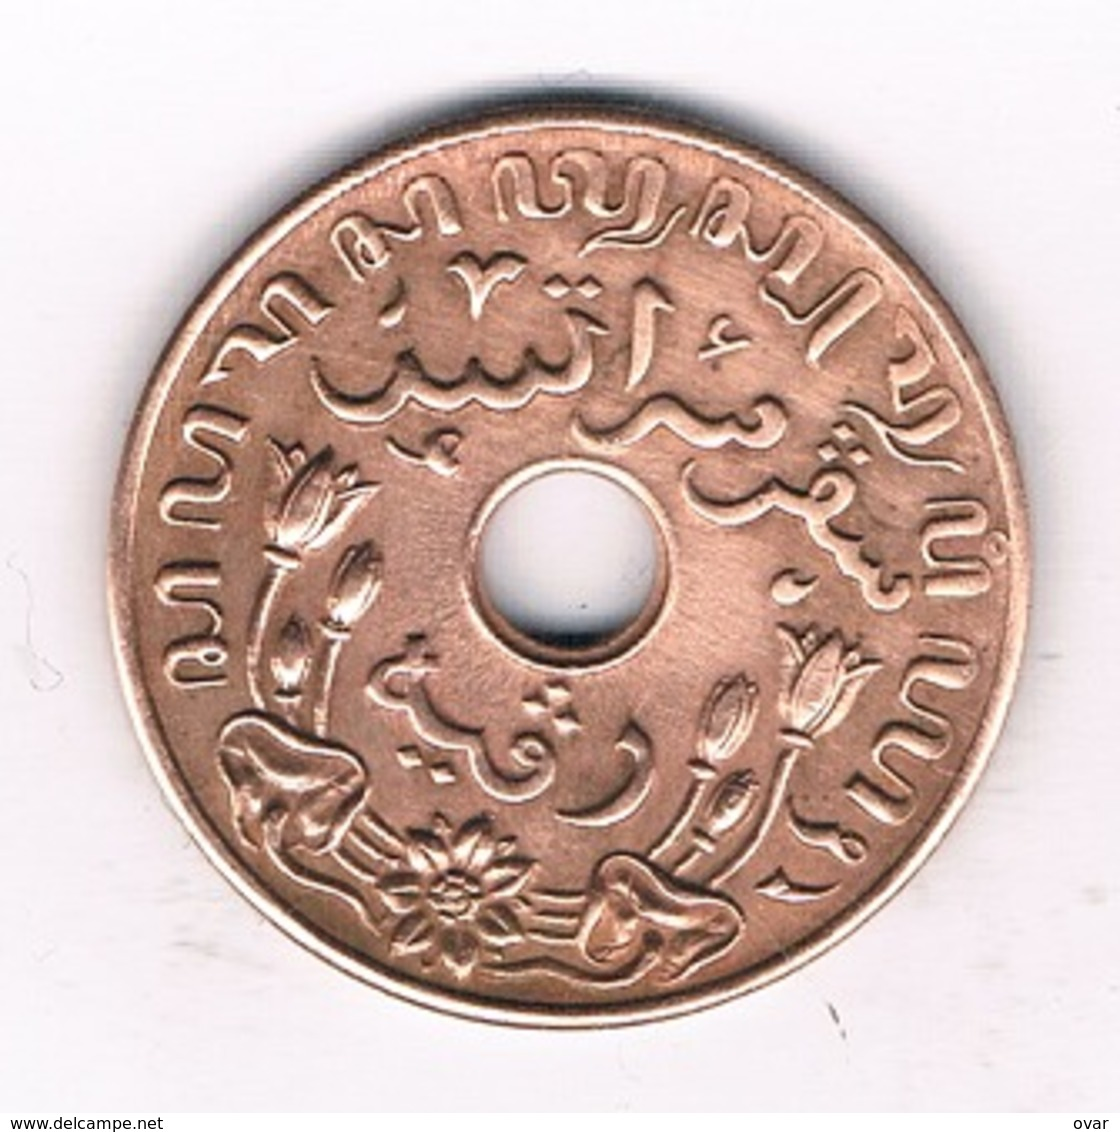 1 CENT 1945 NEDERLANDS INDIE /8192/ - [ 4] Colonies